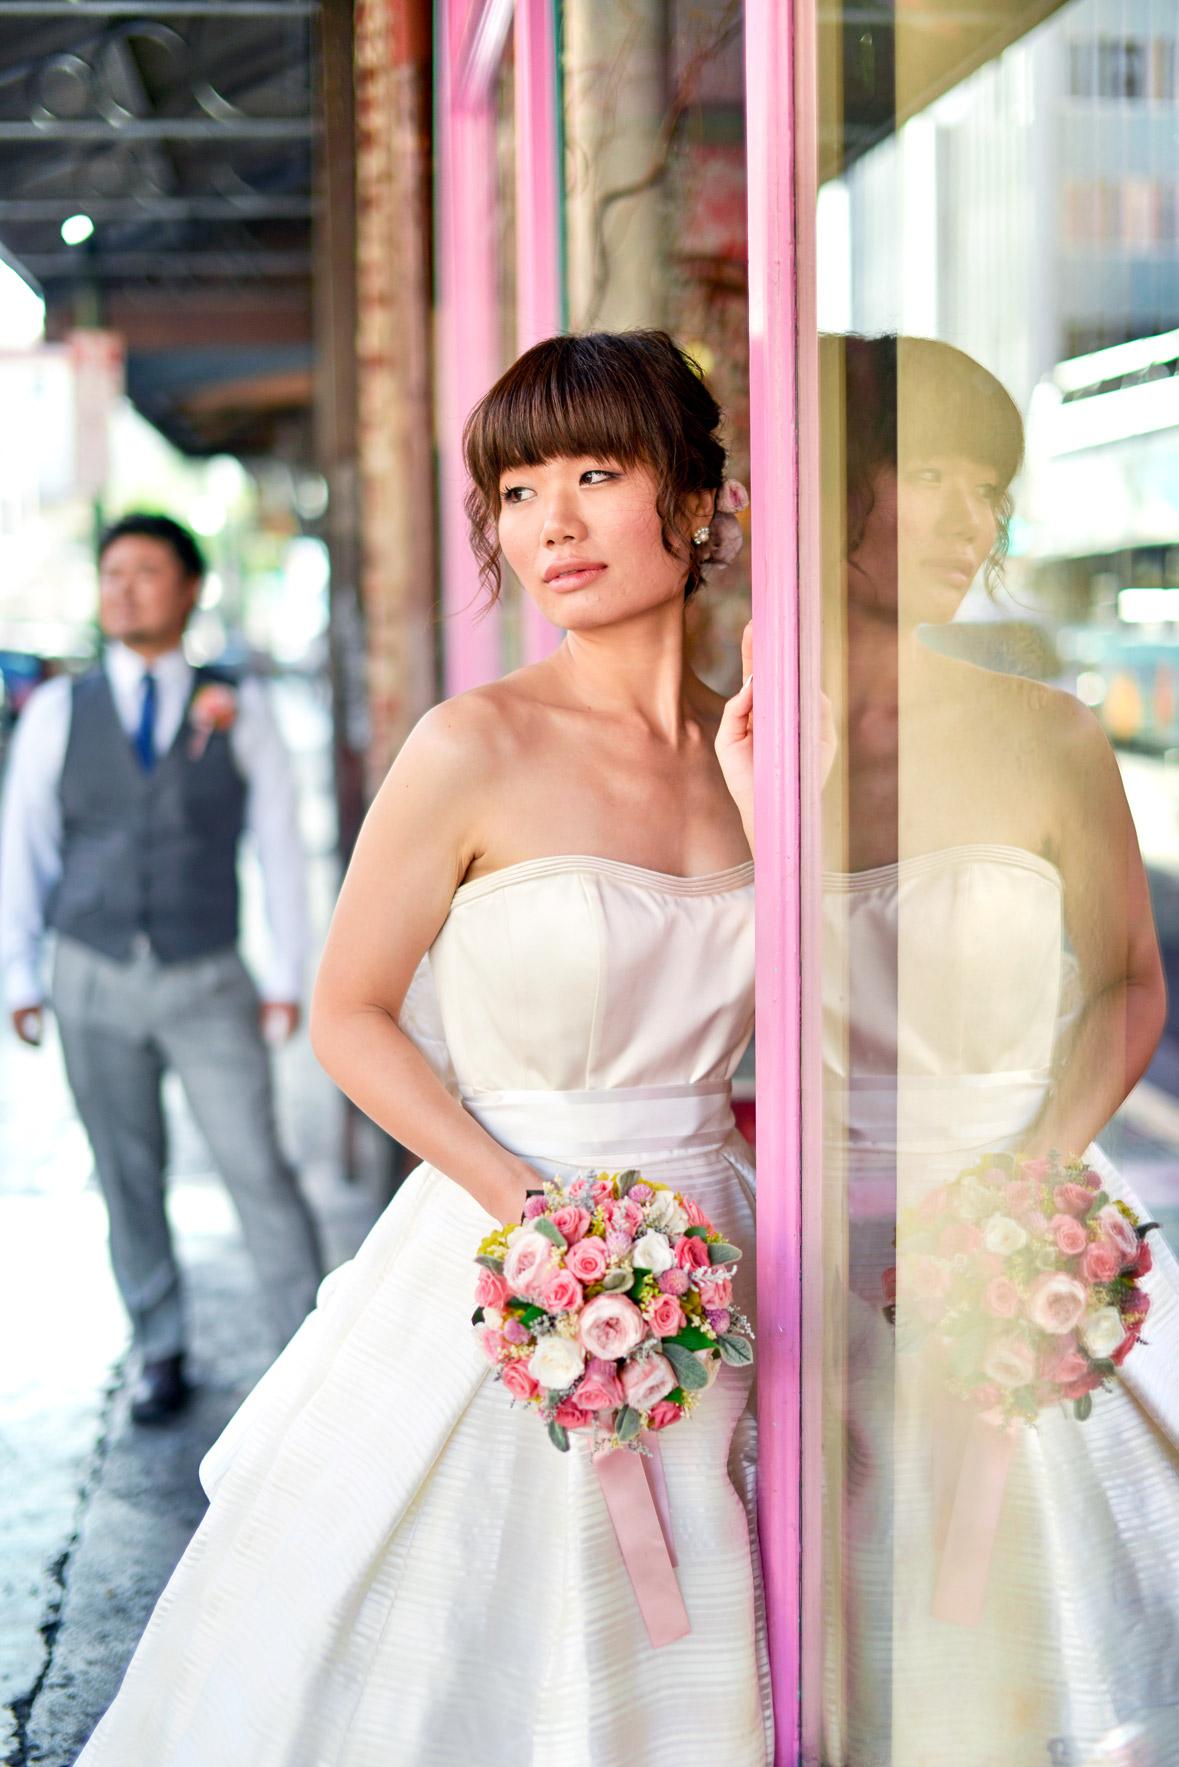 waikiki-beach-wedding-and-downtown-honolulu-hawaii-theater-stephen-ludwig-photography033.jpg